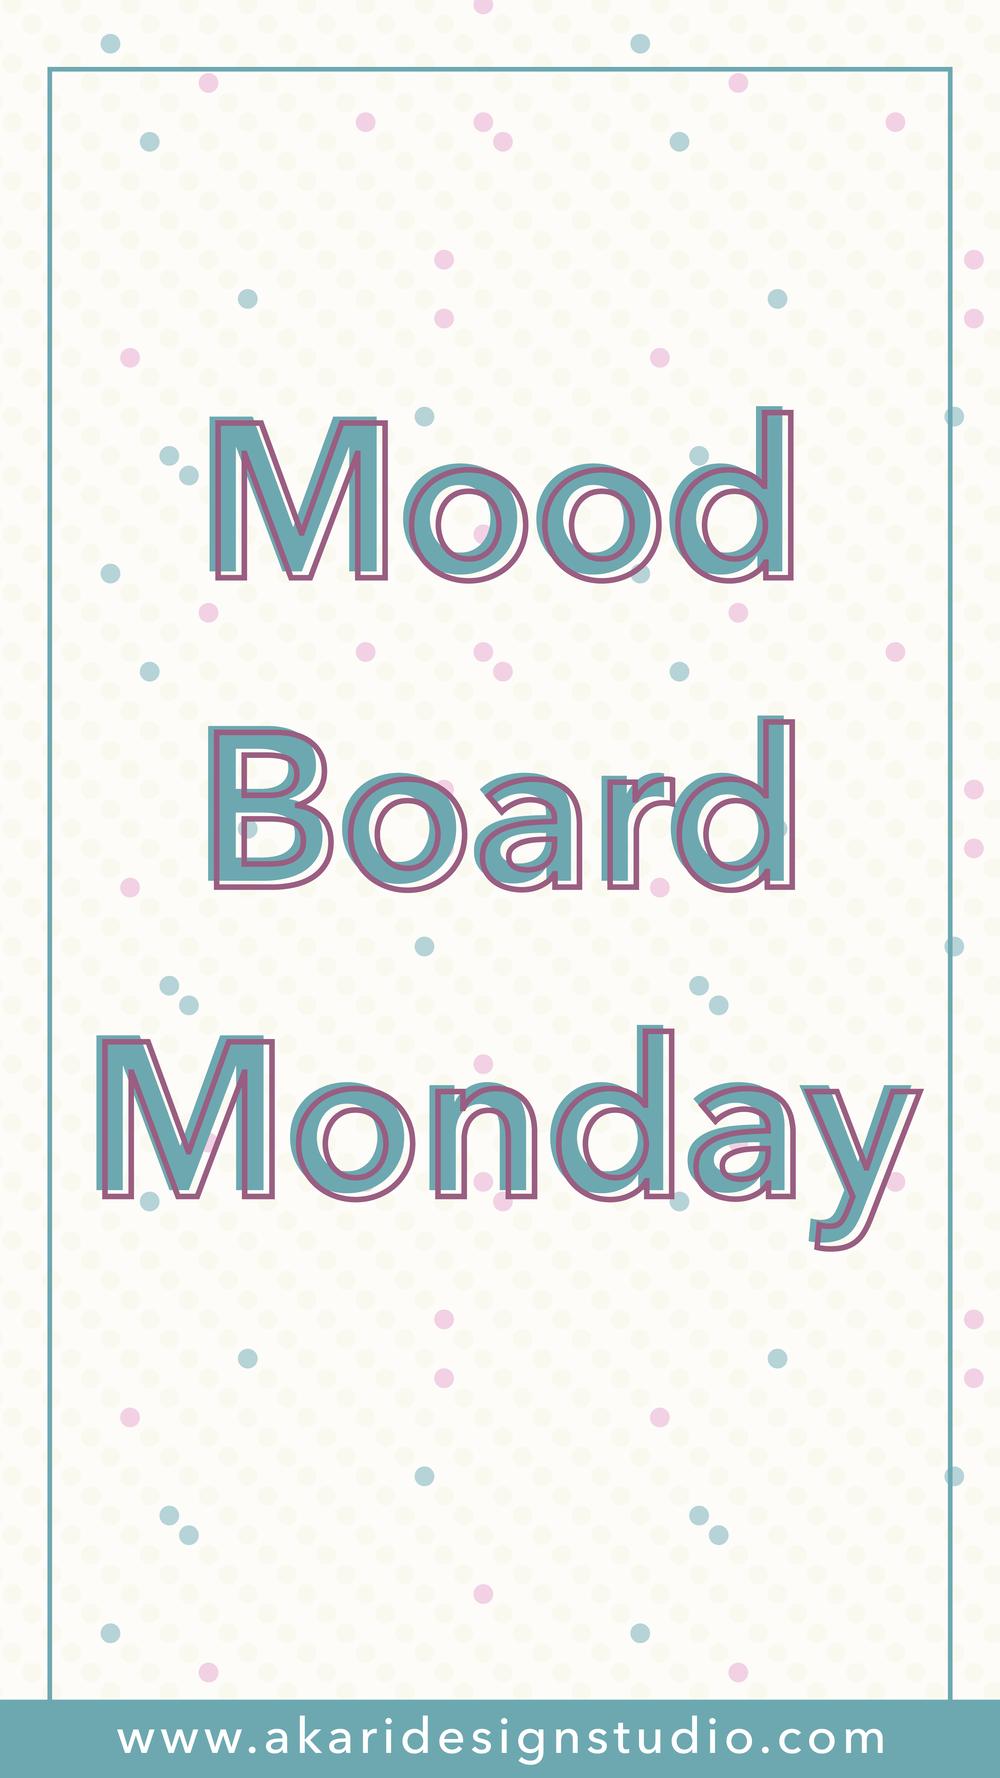 black style board. cute heart patterns. hire graphic designer for branding. brand identity guidelines. brand style board. black and white mood board. black and pink mood board. hire corporate identity designer.